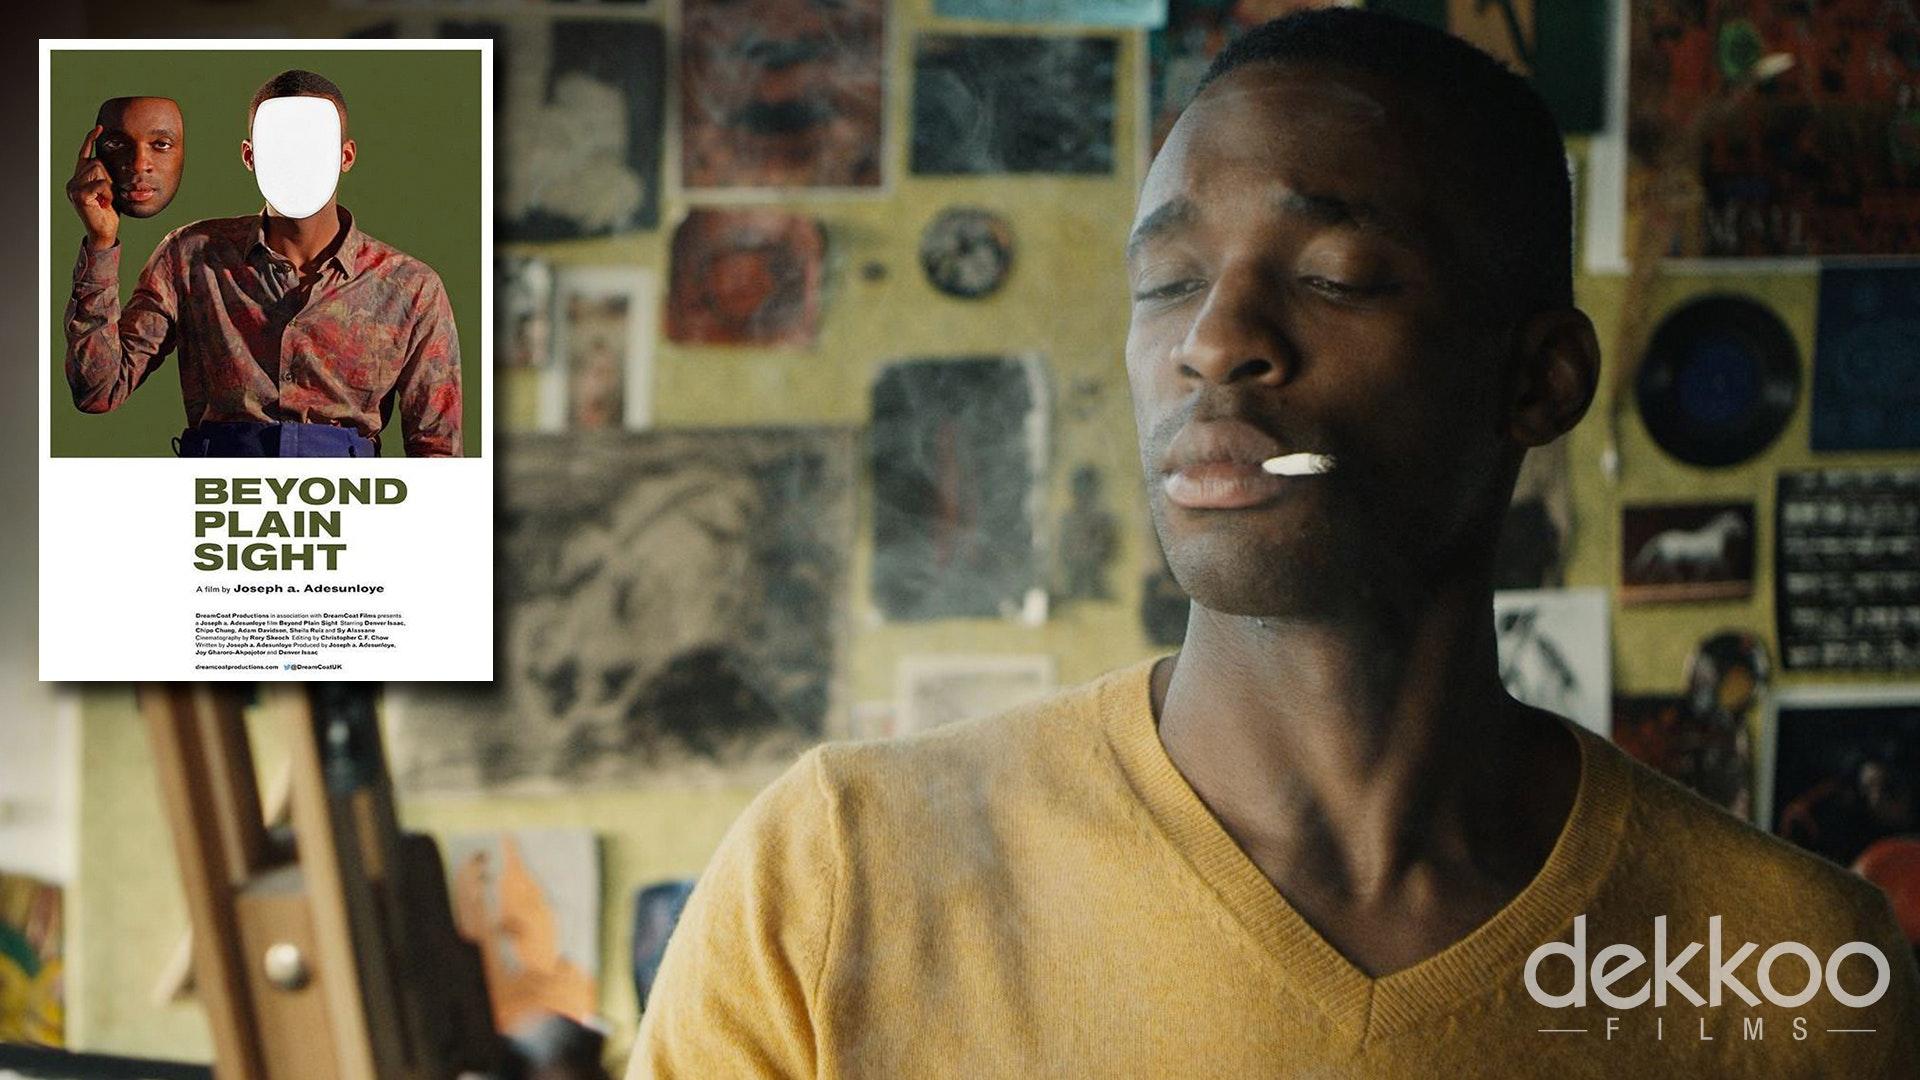 Фильм гей прайм 2011 2012 франция онлайн